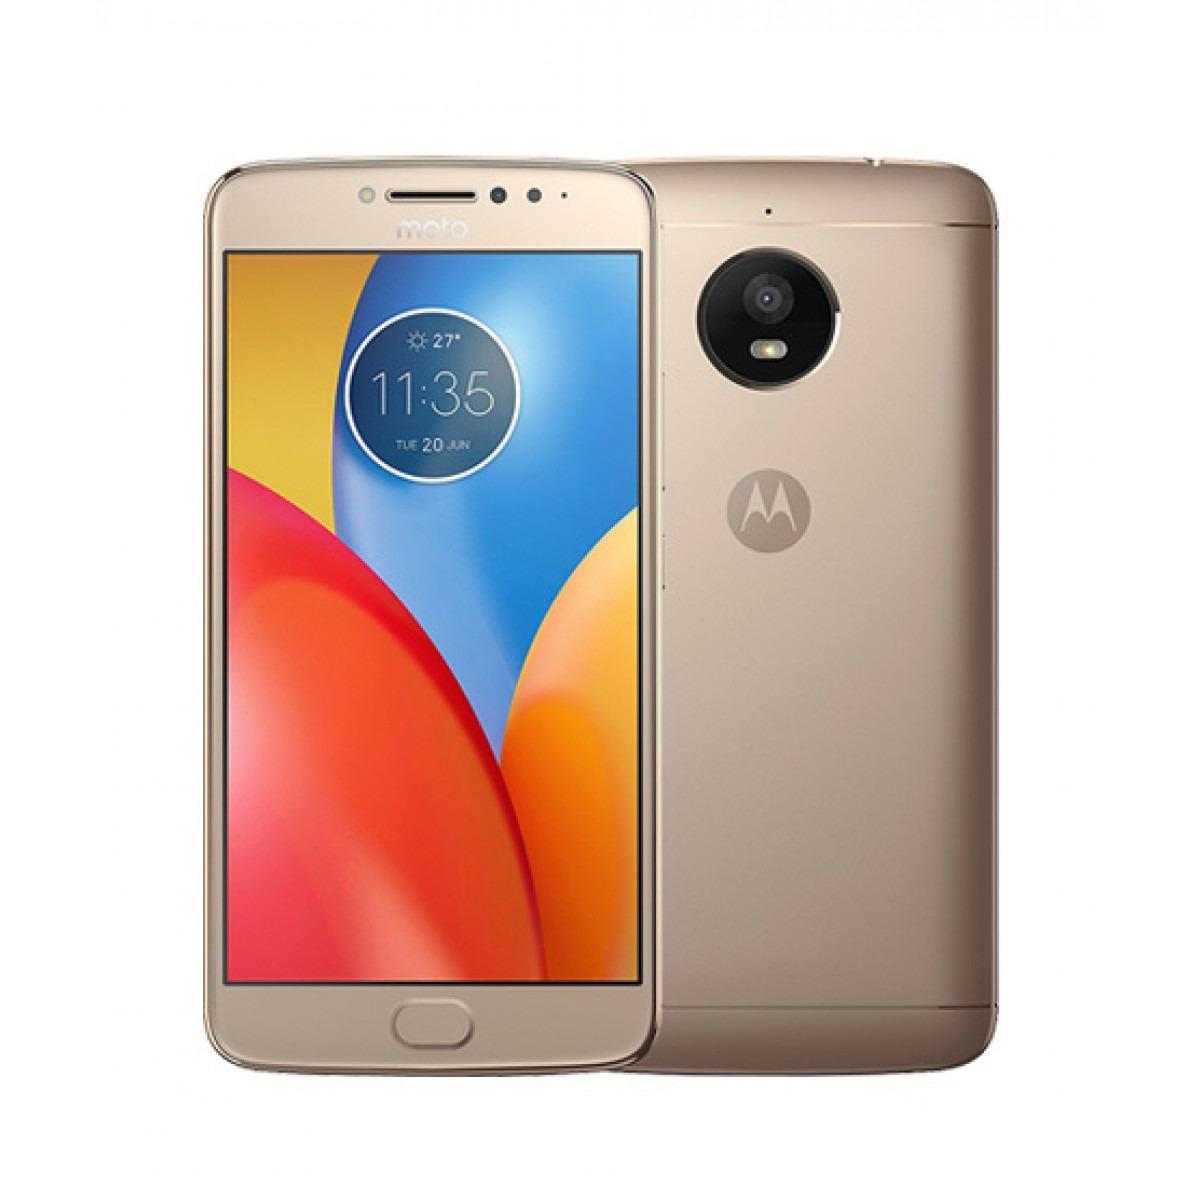 Motorola Moto E4 - 2/16 GB - Dual SIM - 4G LTE - Gold